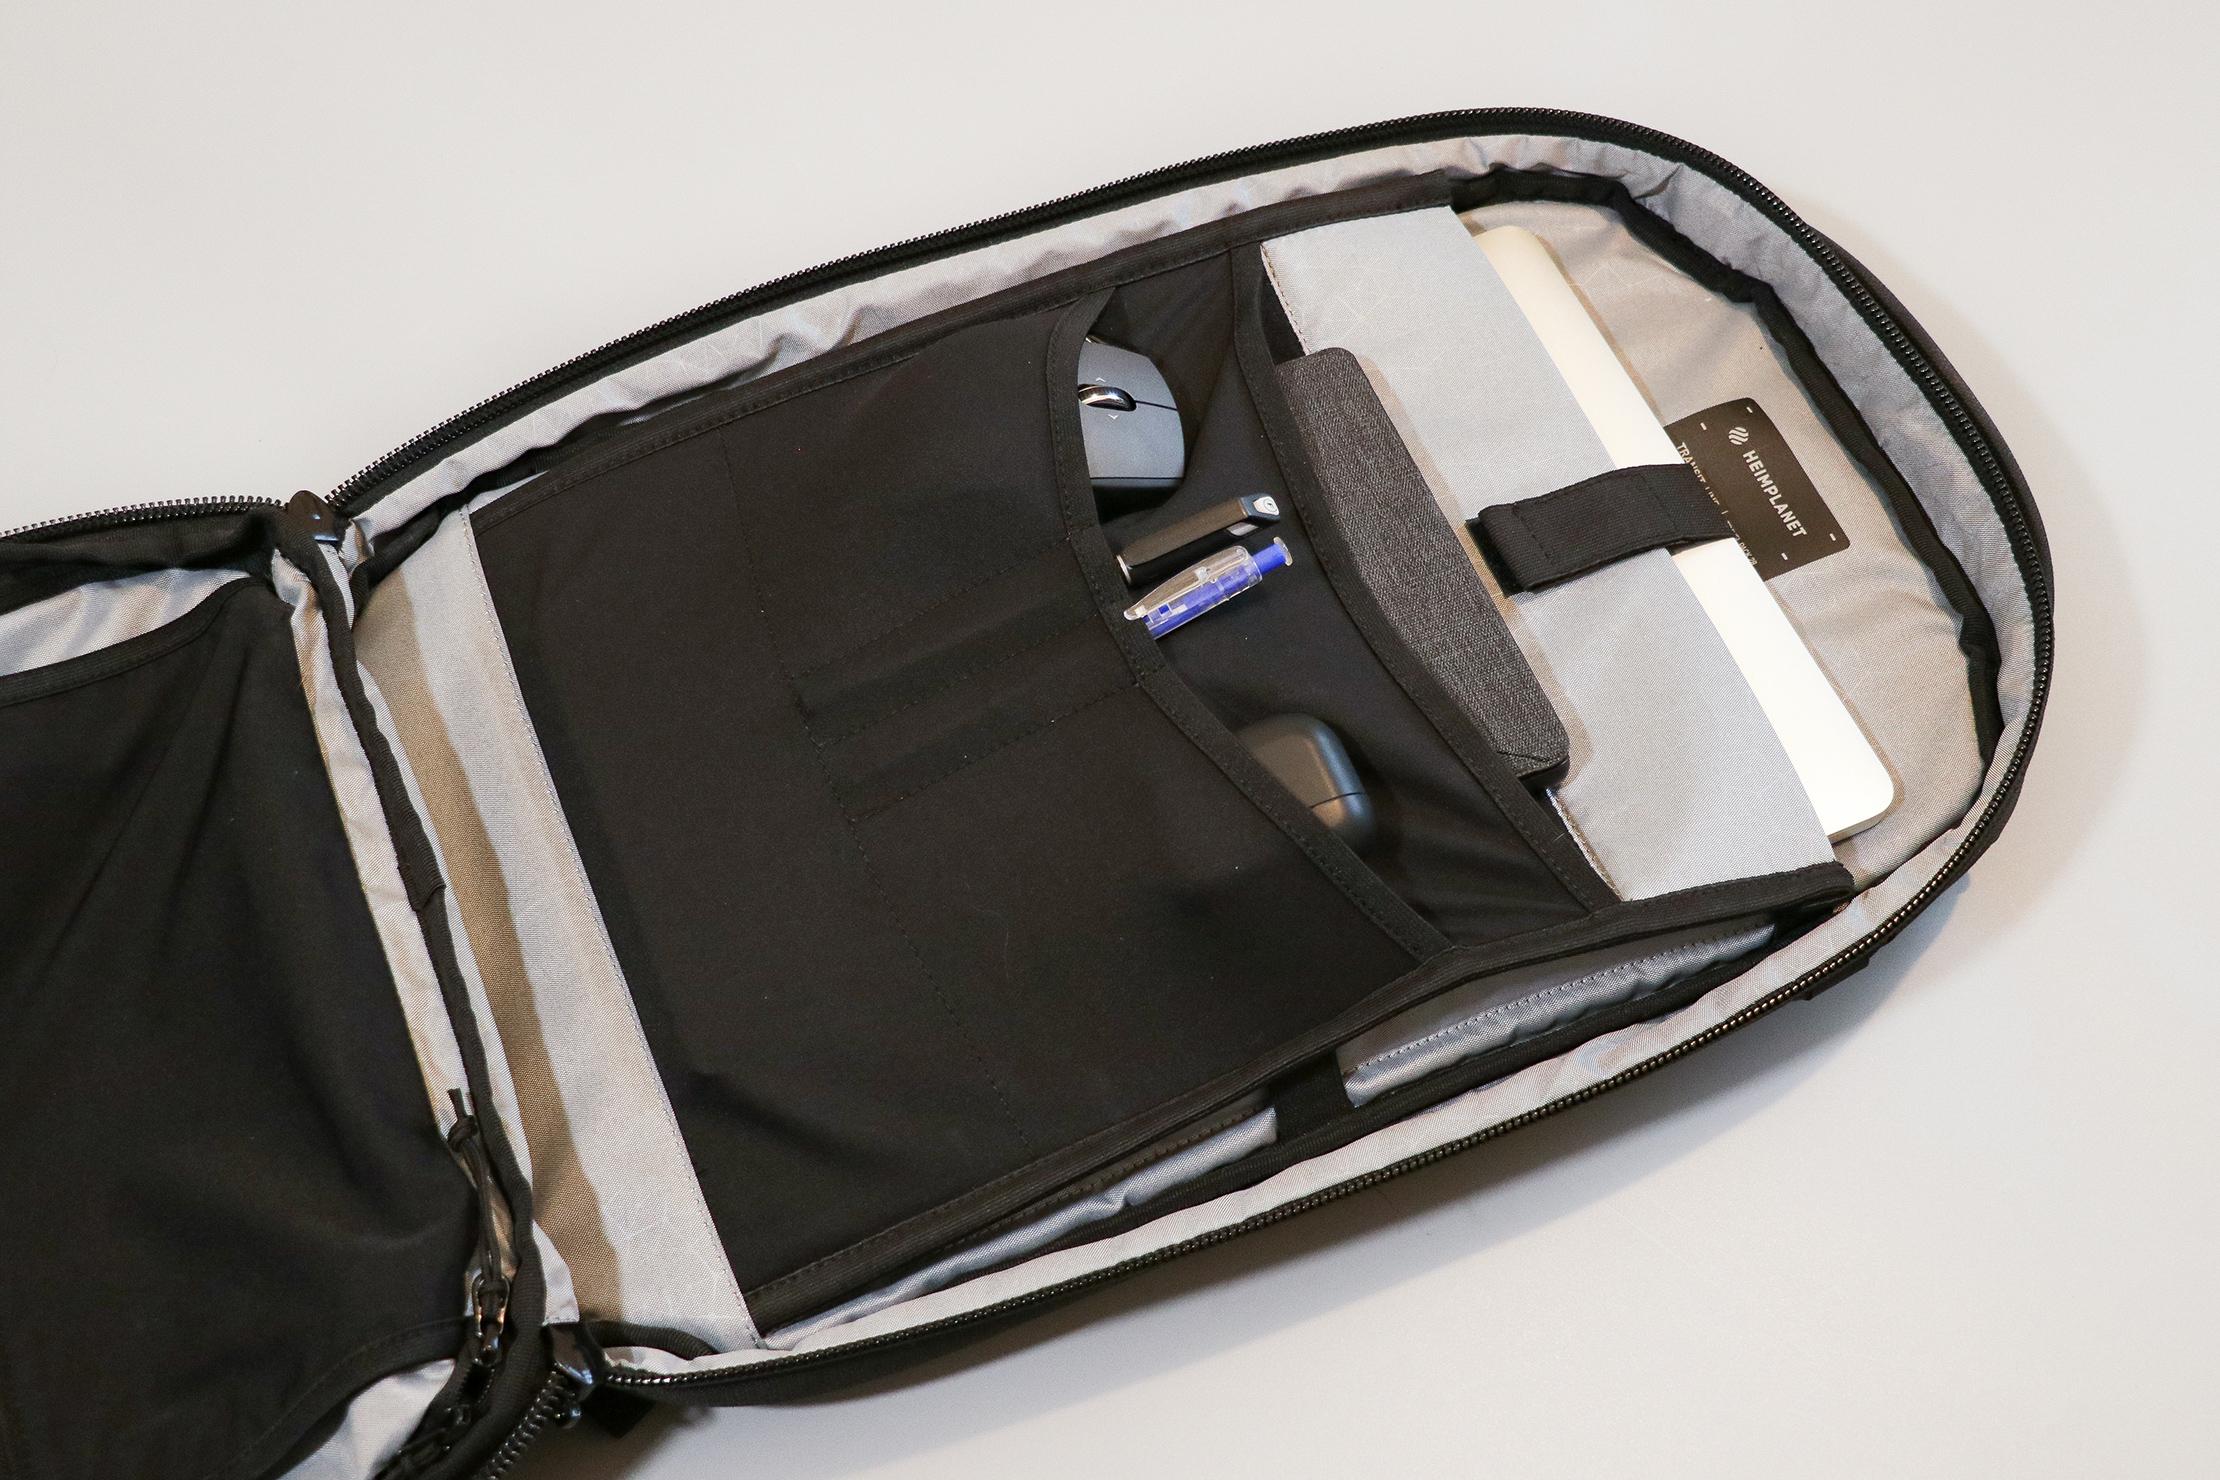 Heimplanet Travel Pack 28L (V2) Main Compartment Tech Organization